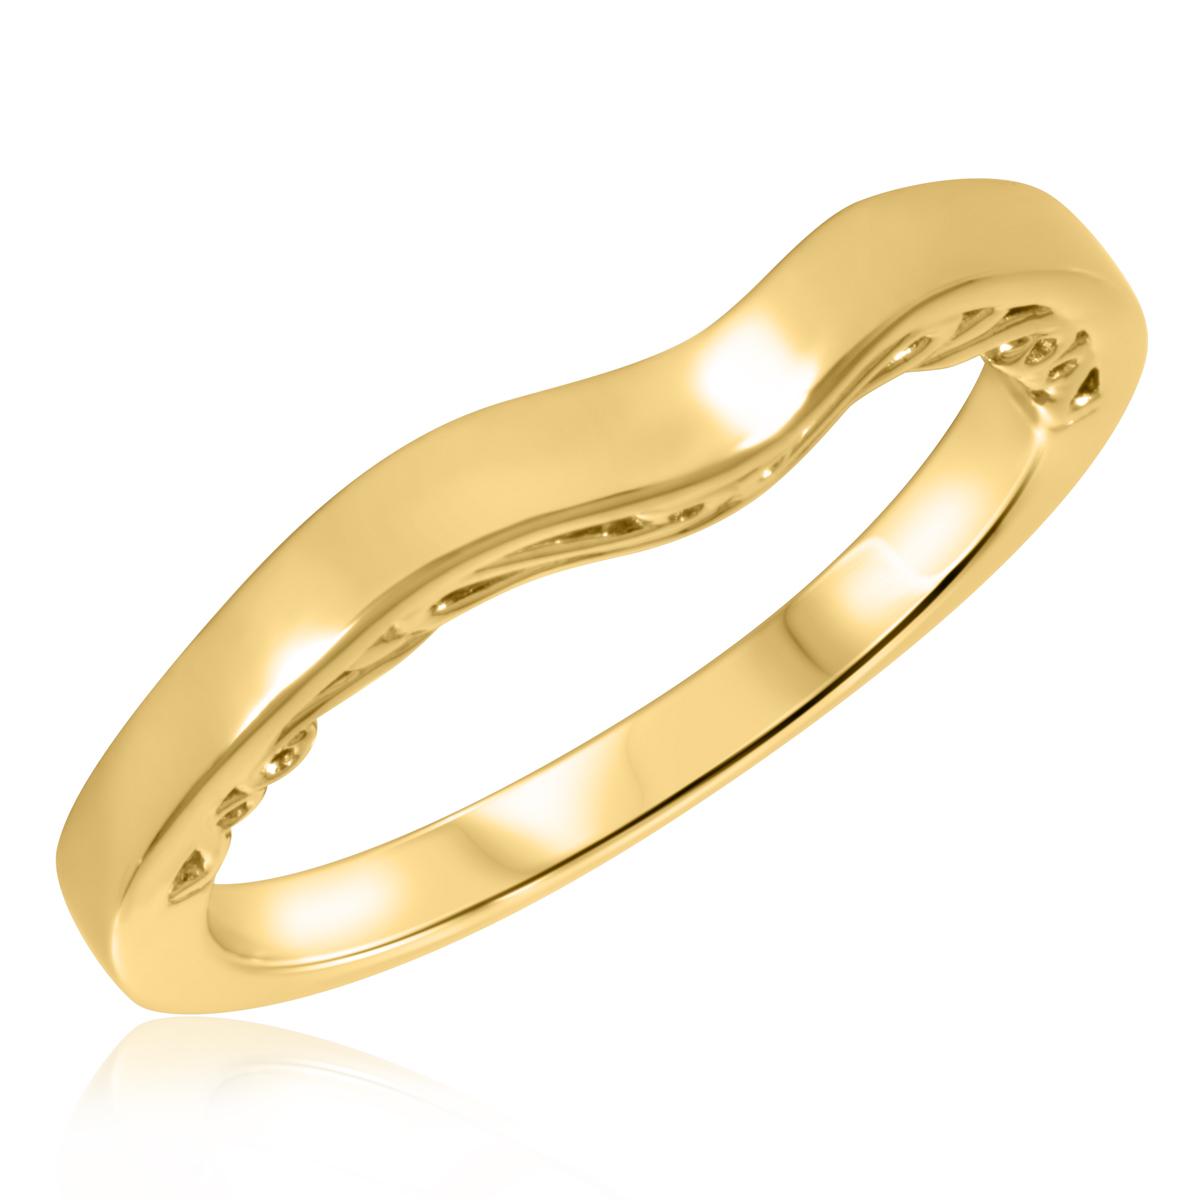 Diamond Ladies Wedding Band 10K Yellow Gold- Size 8